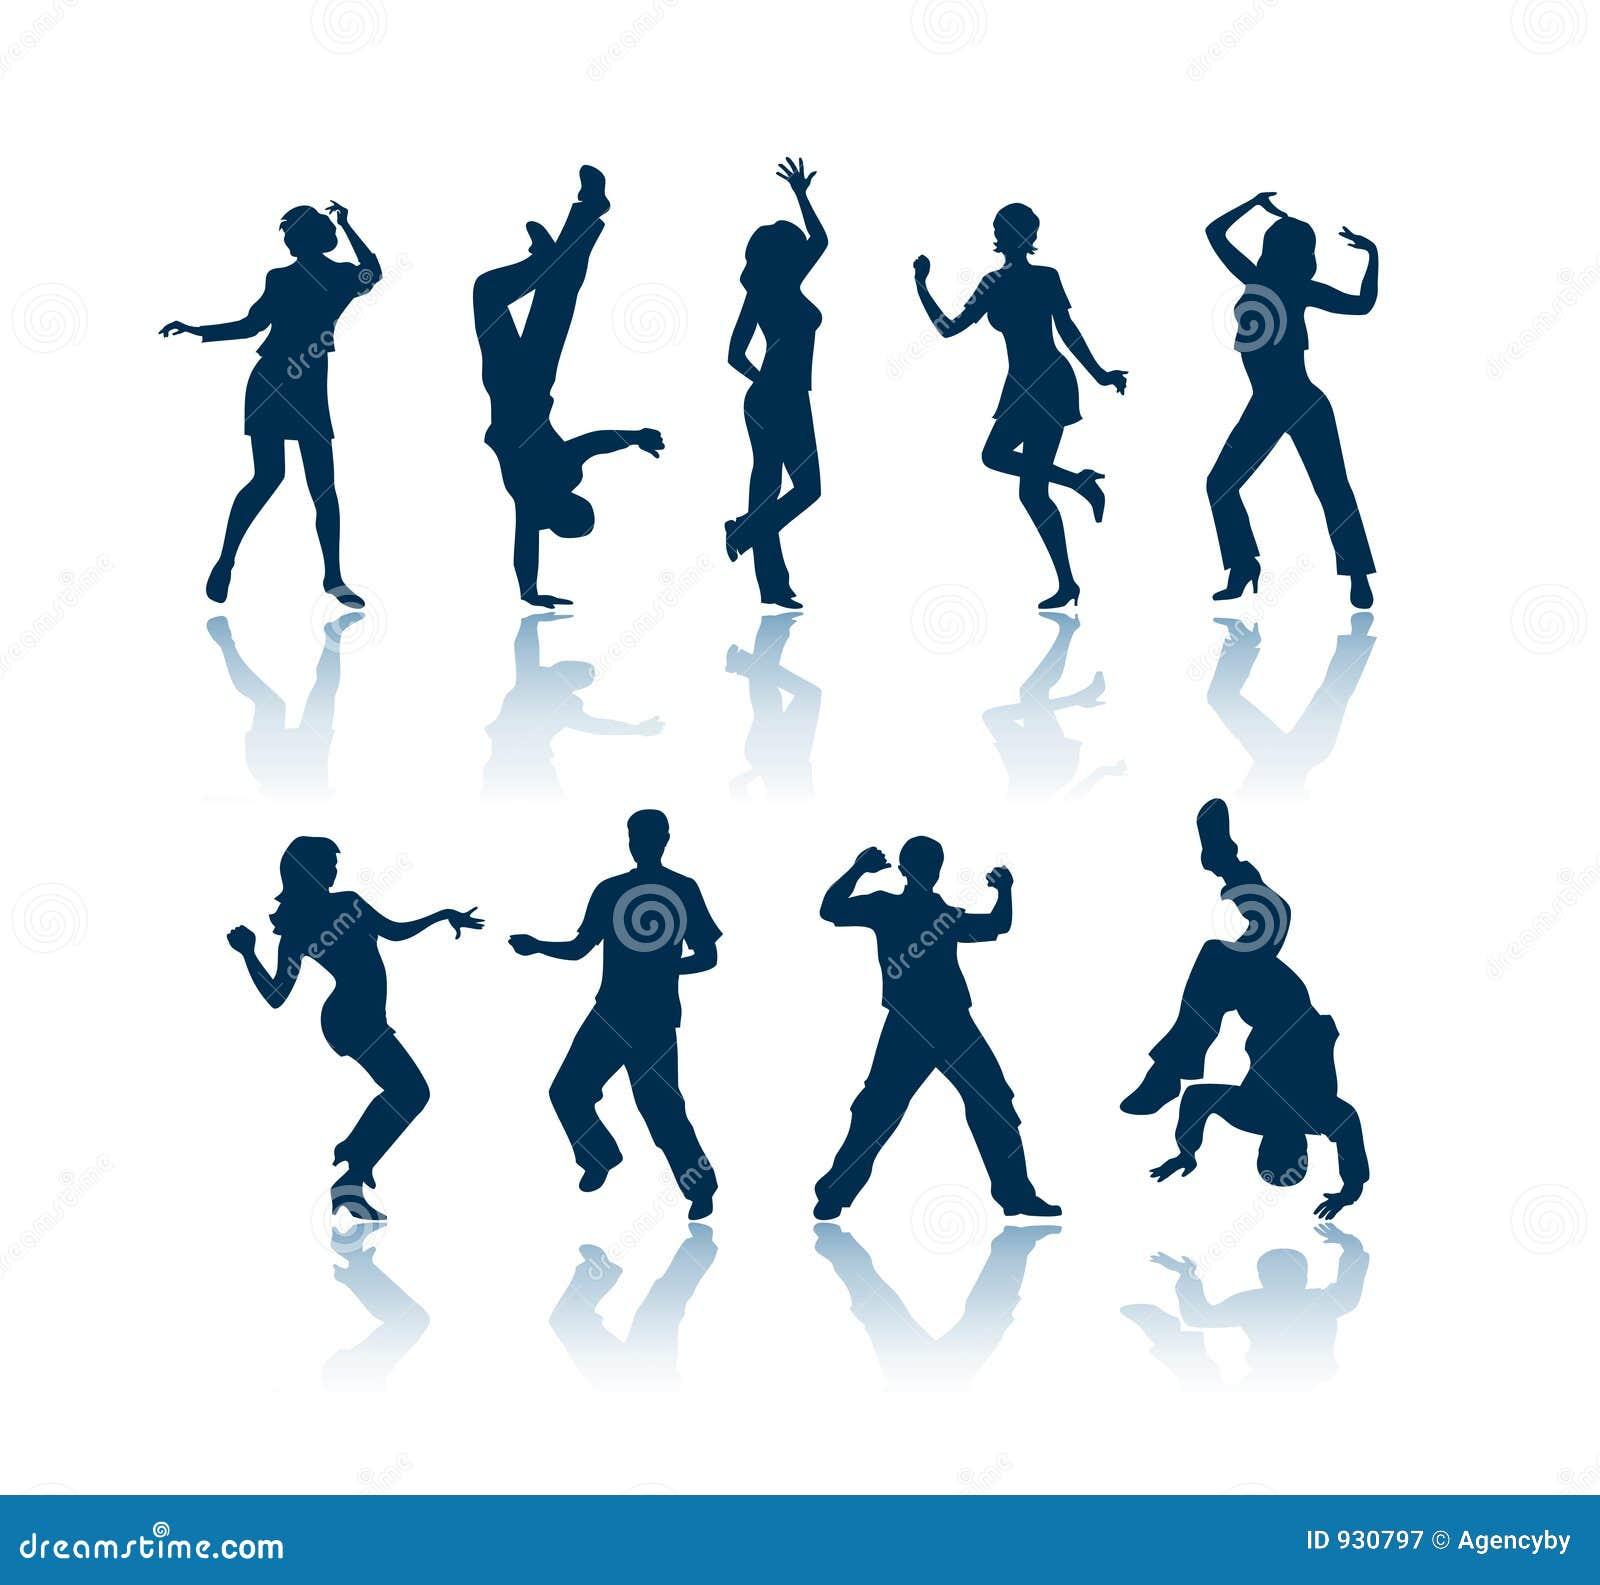 Tańczące sylwetki